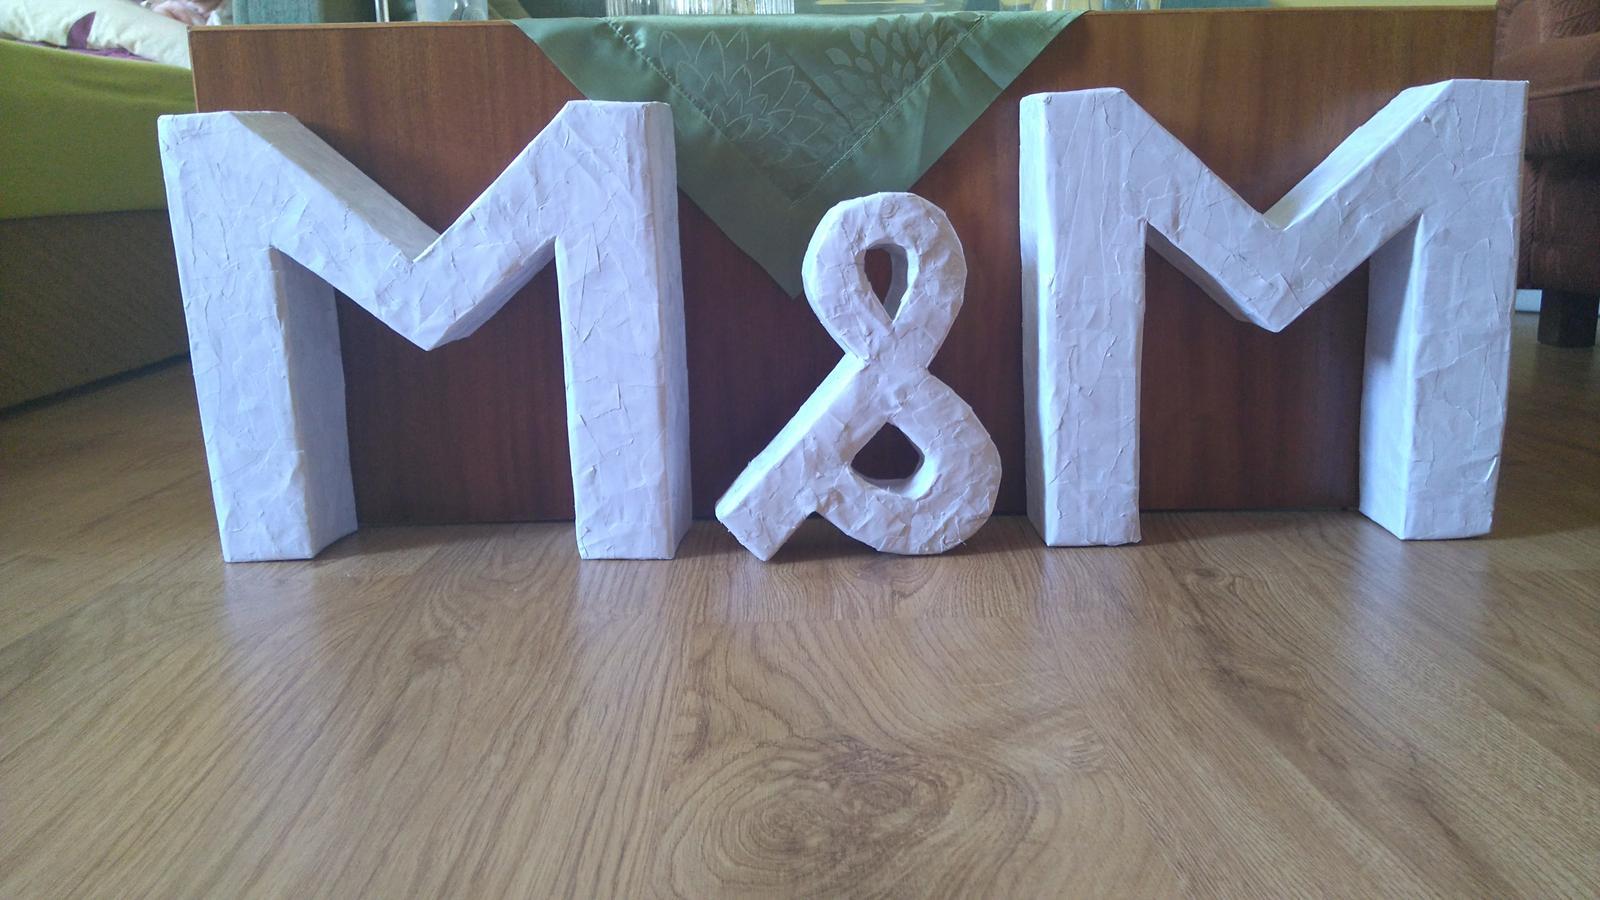 Bude svadba, svadbička :) - už len trošku osmirglovat, aby bol povrch hladký, namaľovať a nalakovat :)